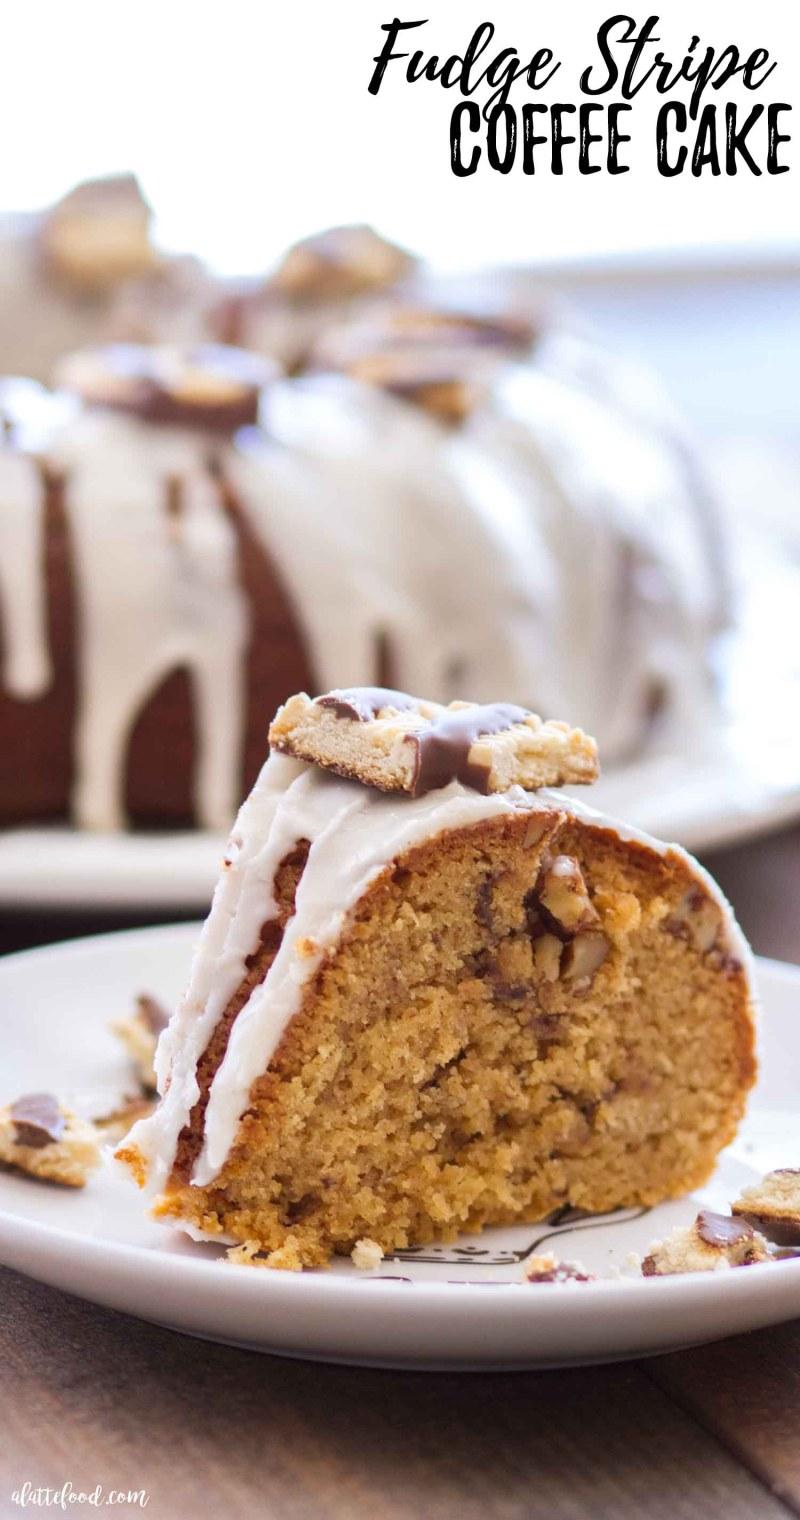 Homemade Fudge Stripe Coffee Cake Recipe Sliced with a Homemade Vanilla Glaze